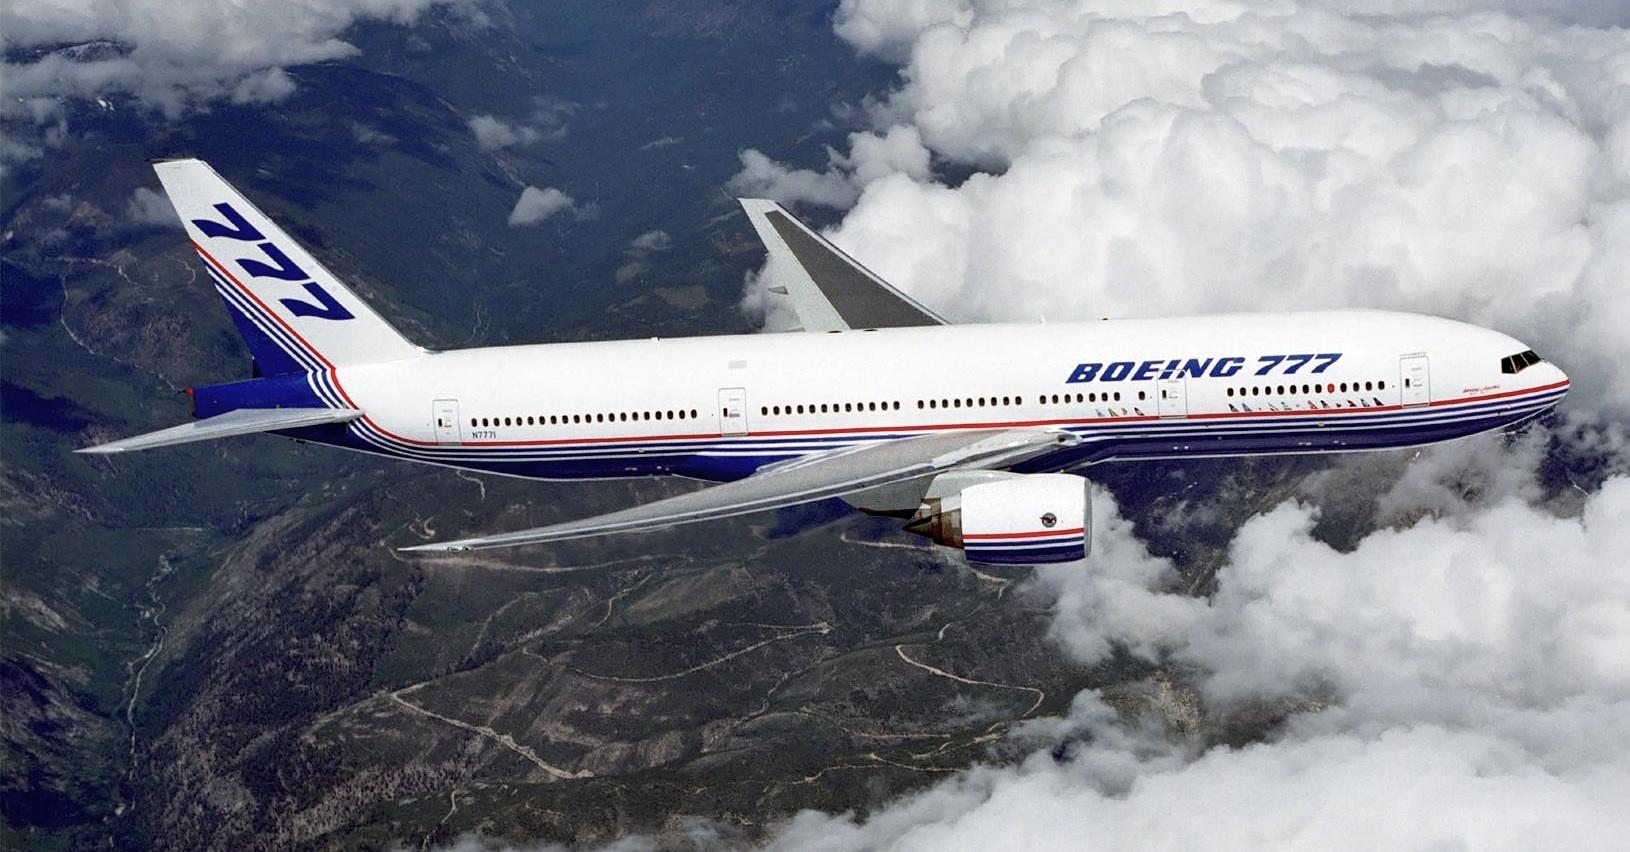 Boeing 777 (Photo courtesy: Wikipedia)